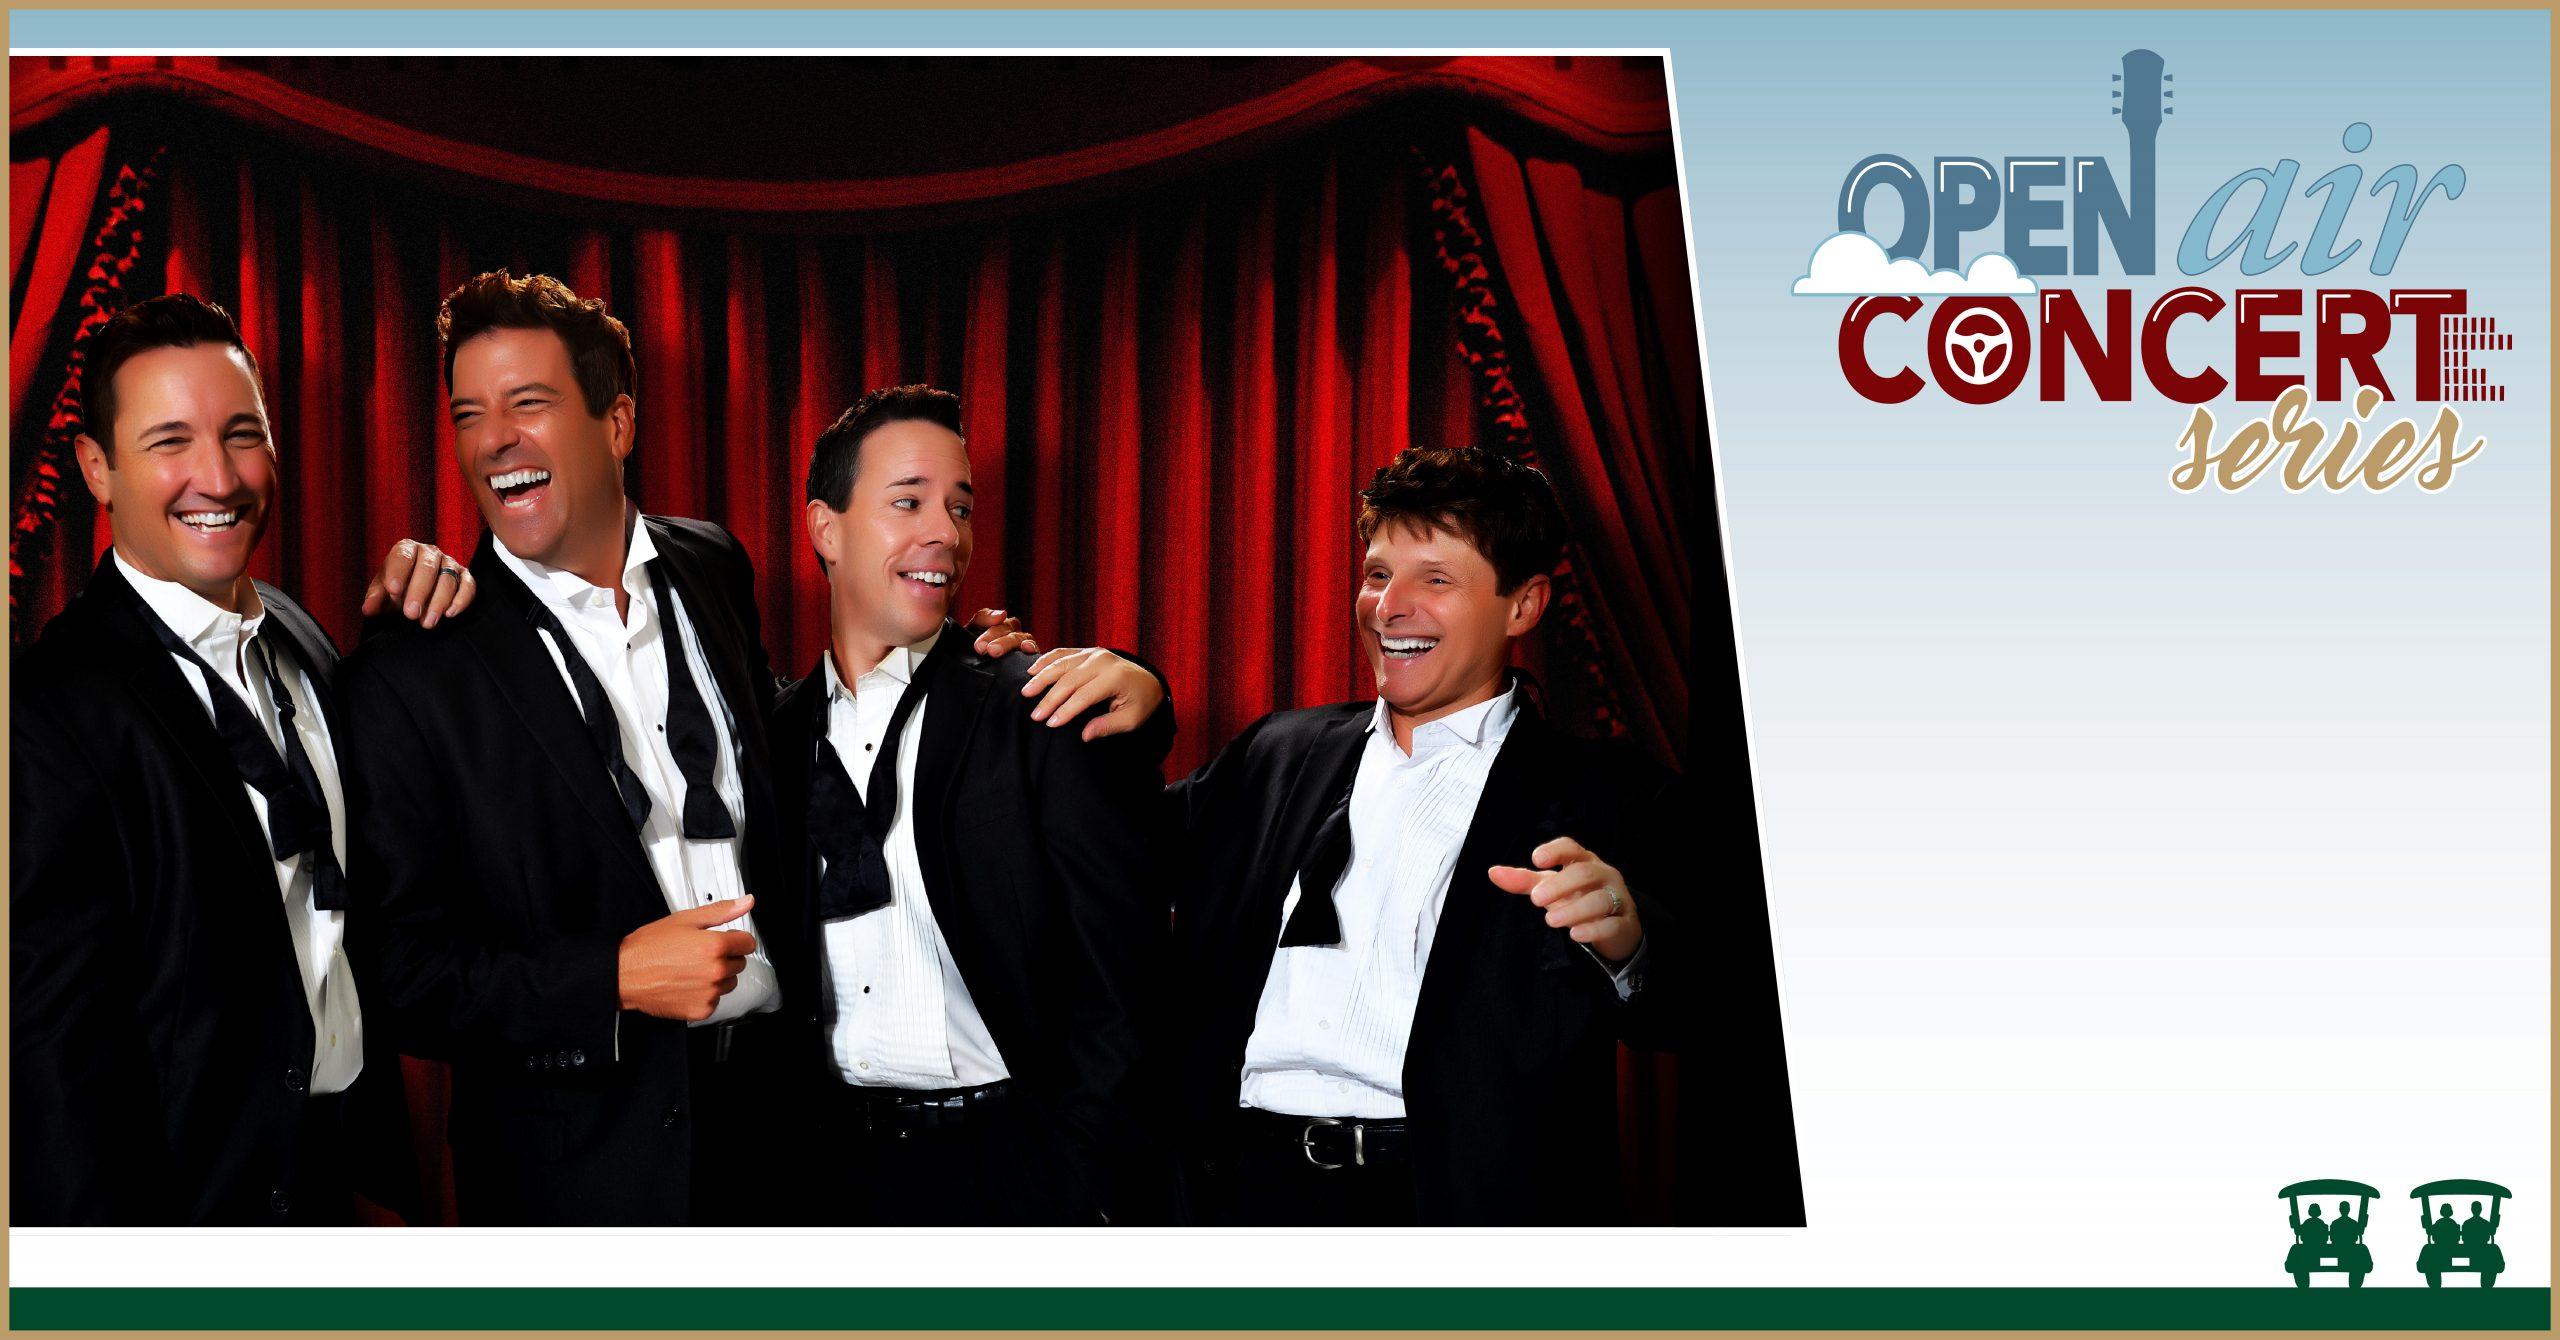 The Open Air Concert Series – The Atlantic City Boys